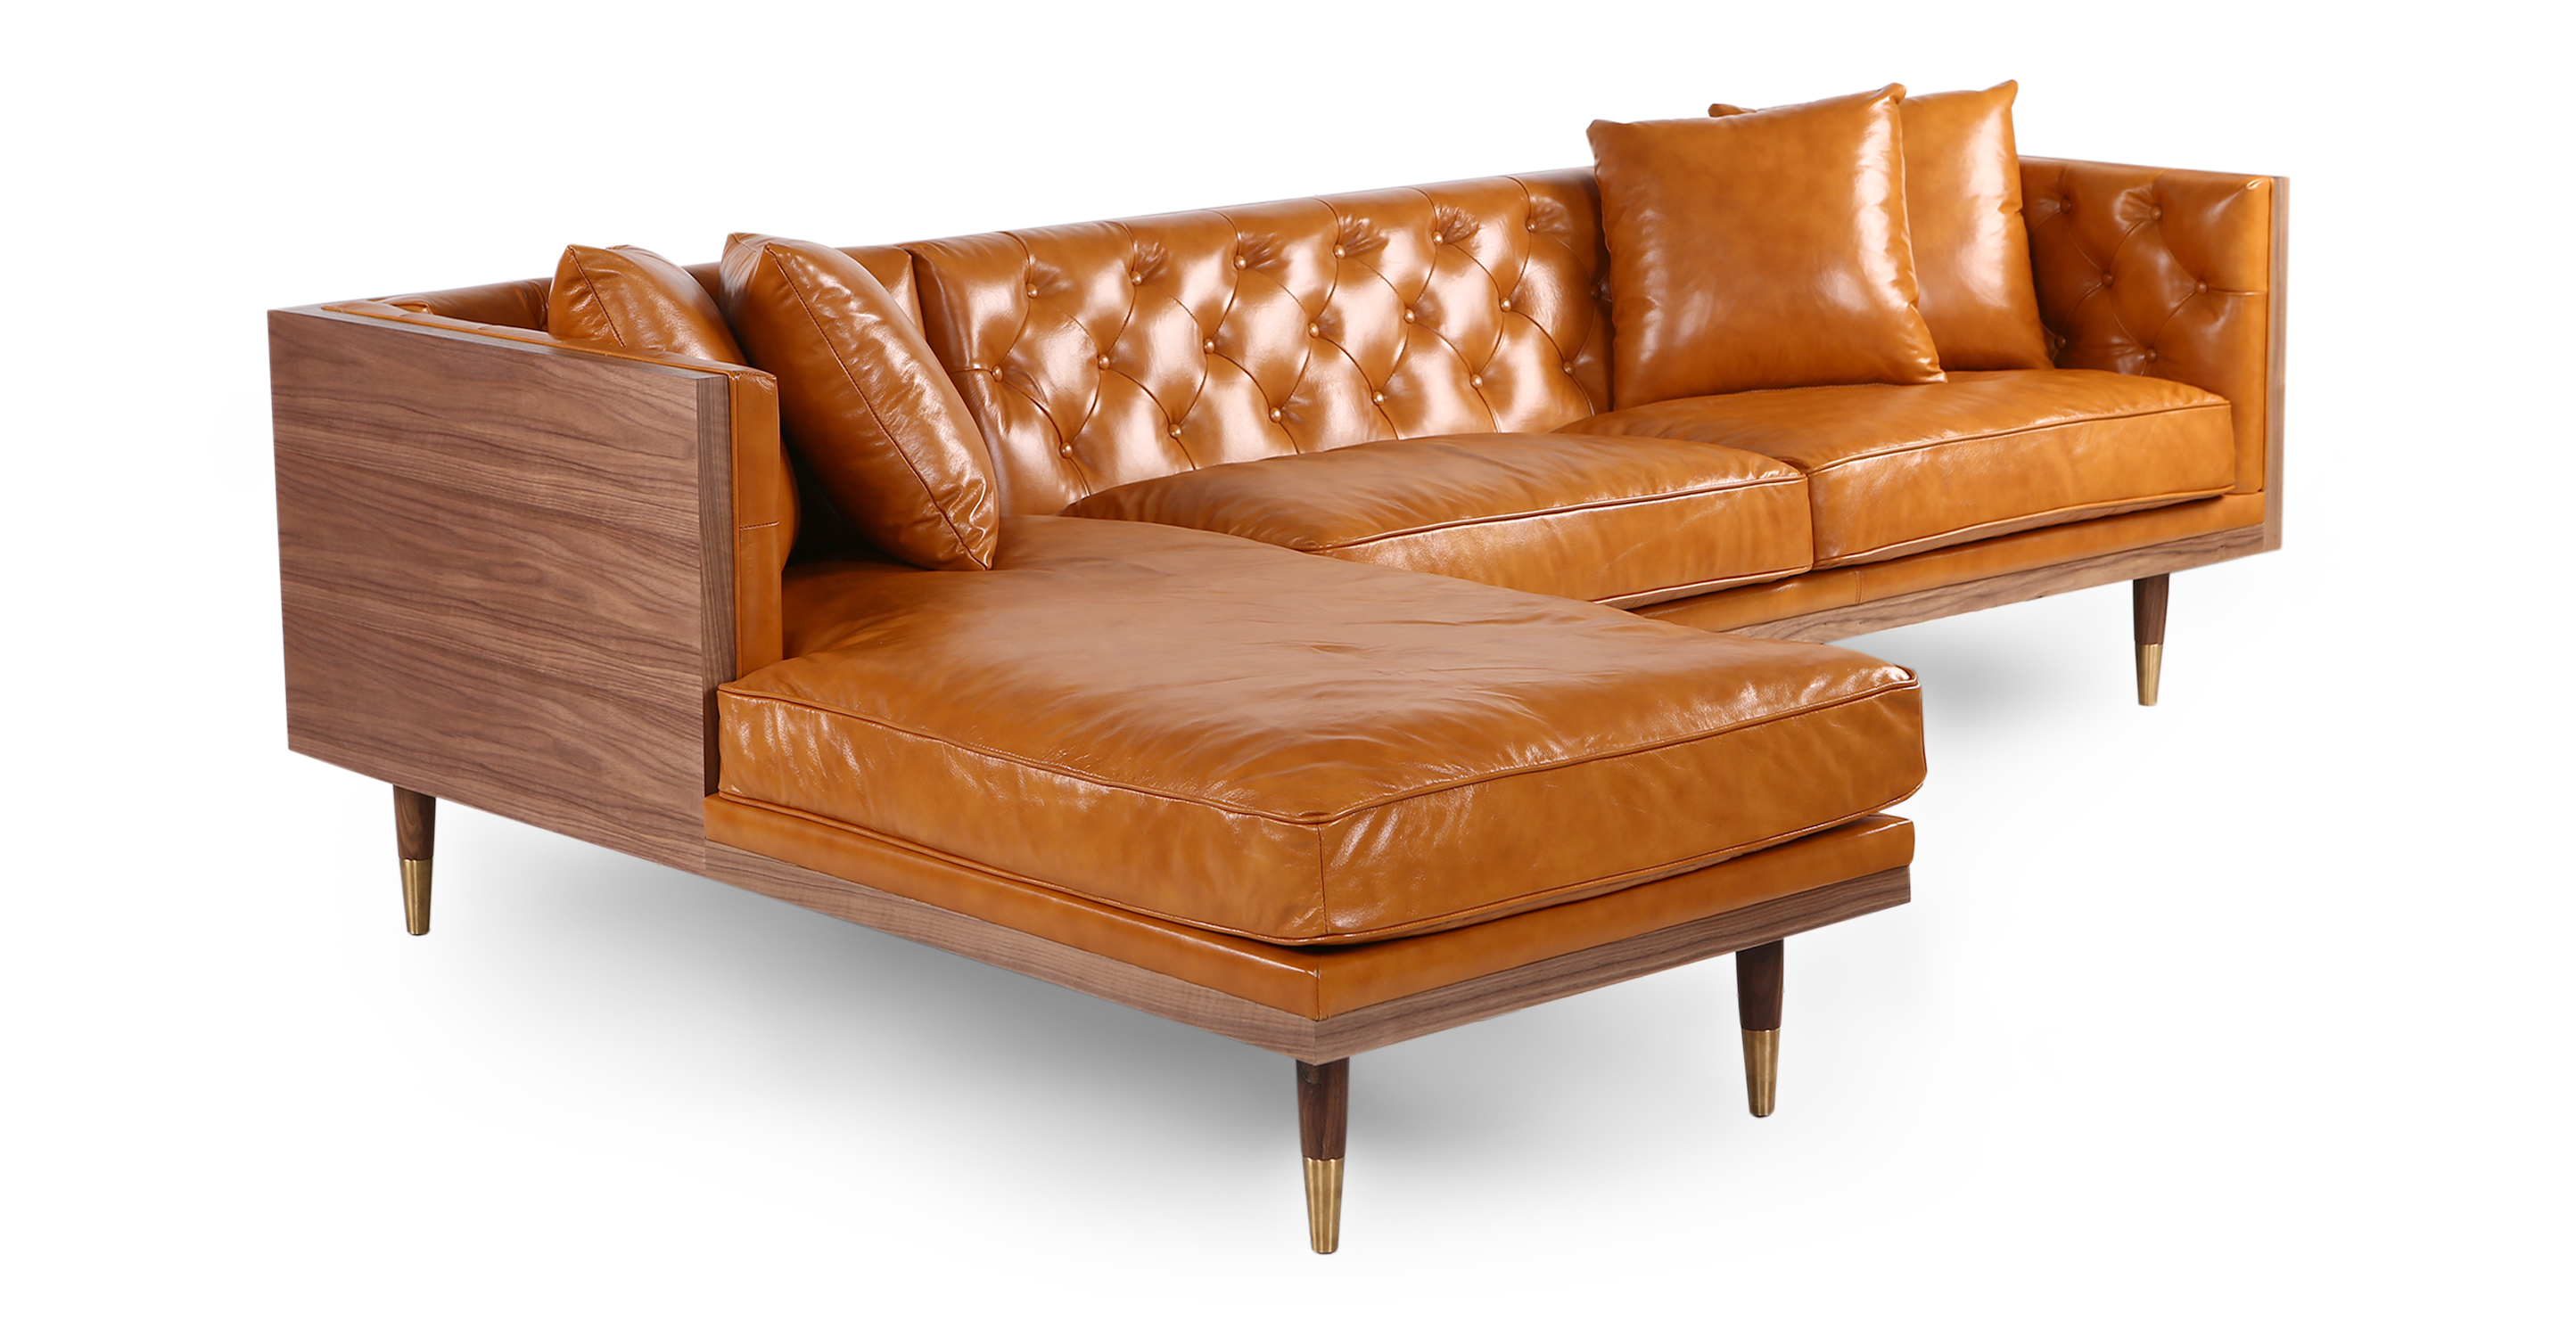 "Woodrow Neo 99"" Leather Sofa Sectional Left, Walnut/Tan Aniline"